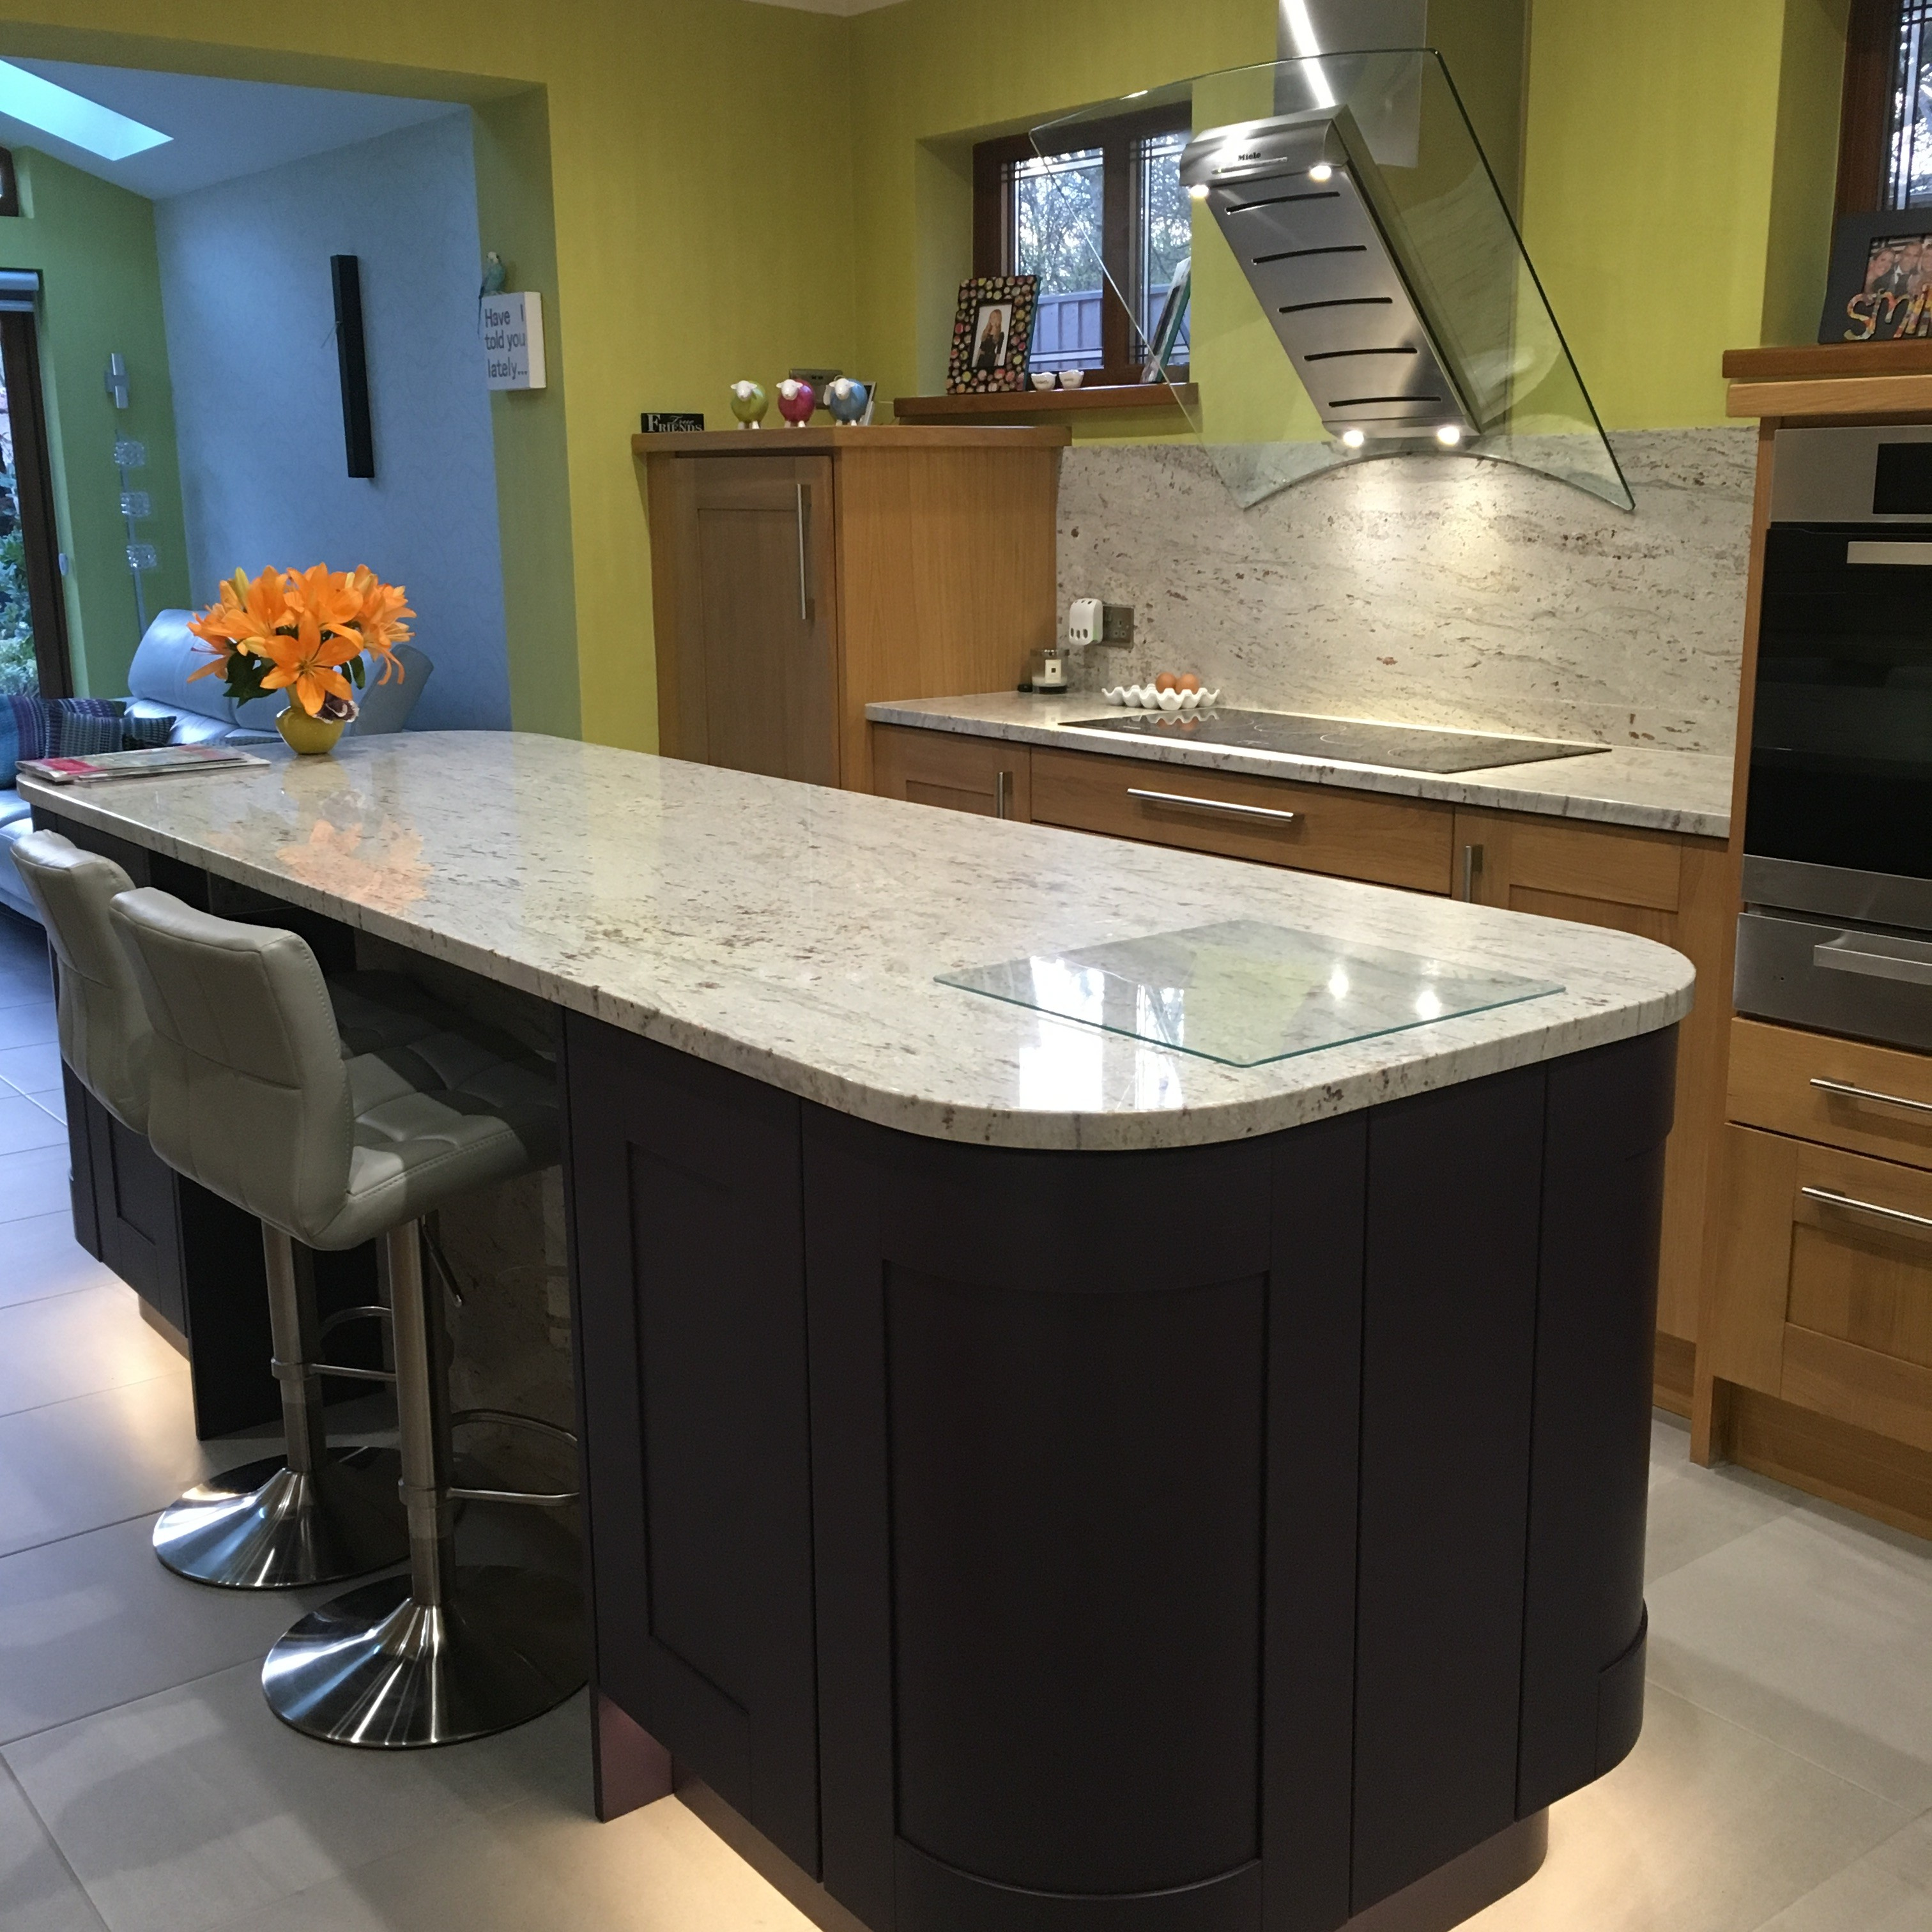 Hand Painted Kitchen Specialist Preston Lancashire - JS Decor